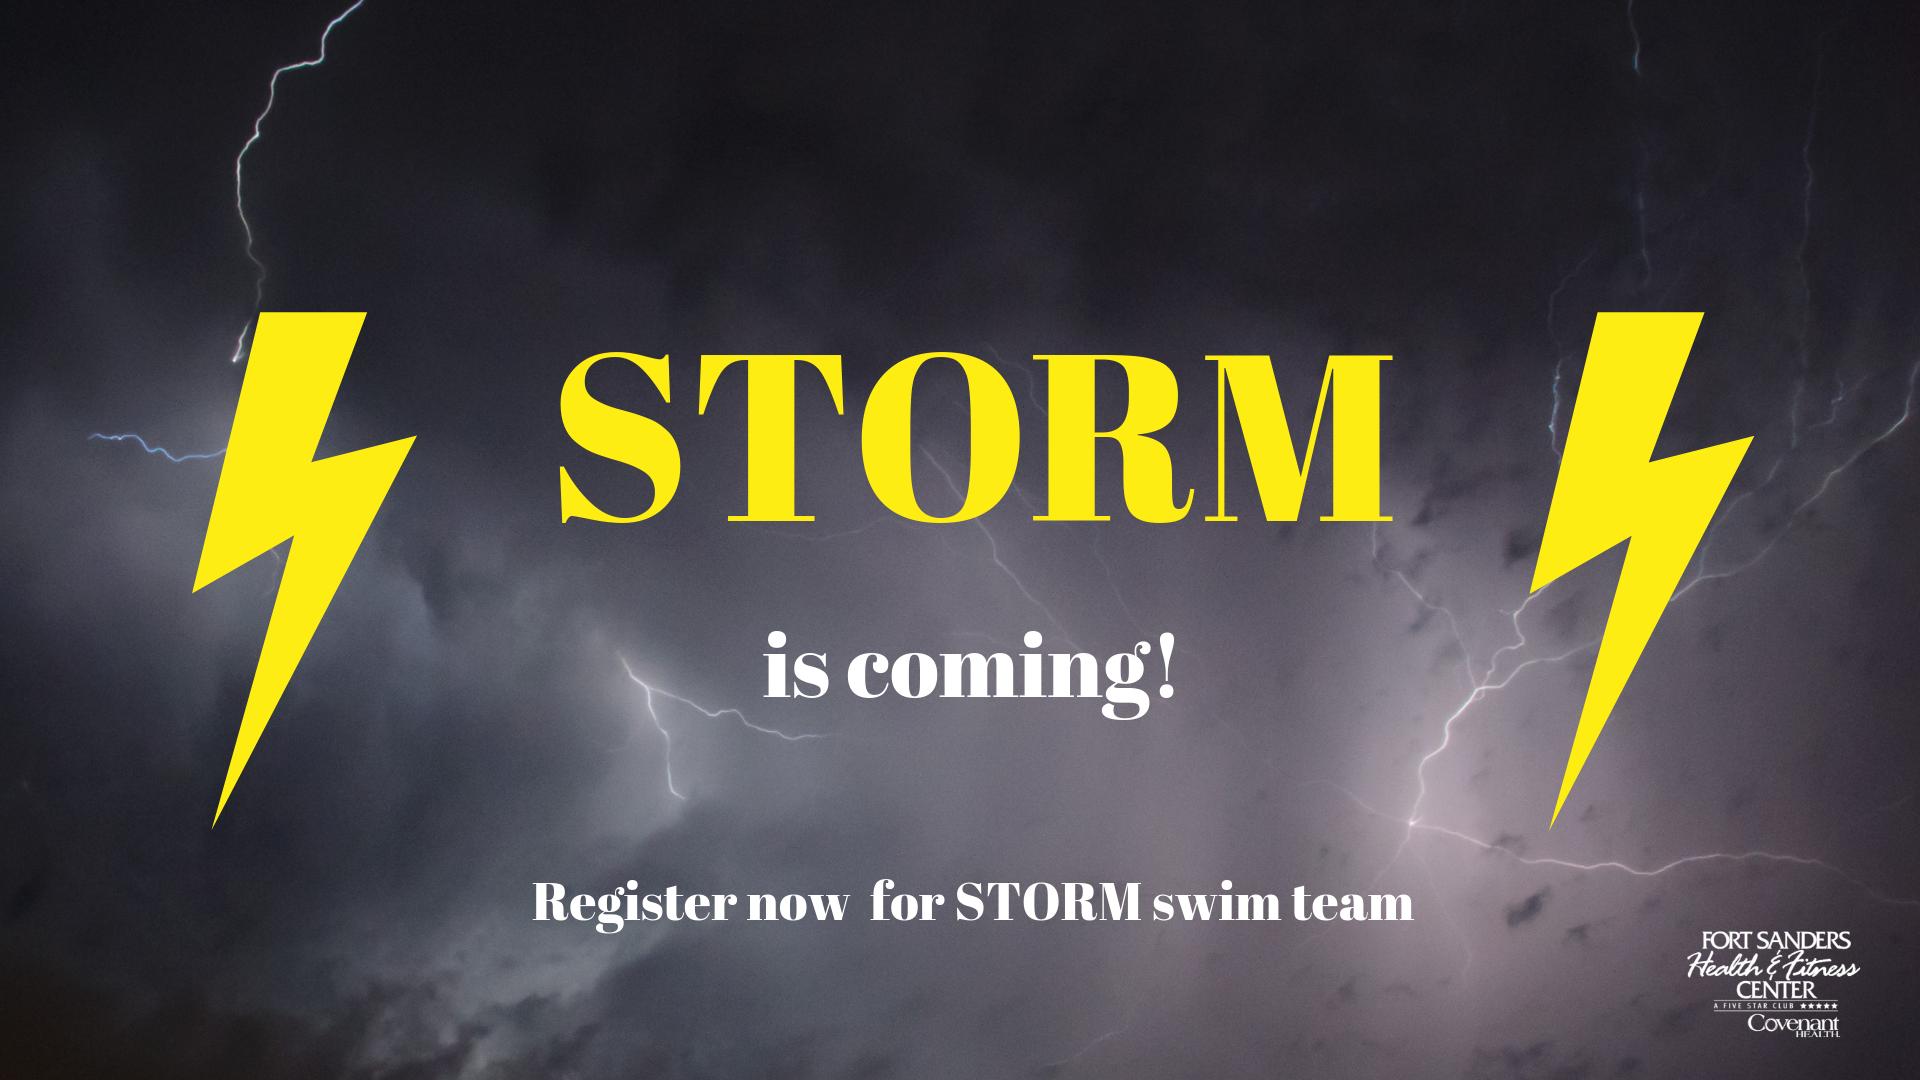 Storm Swim team